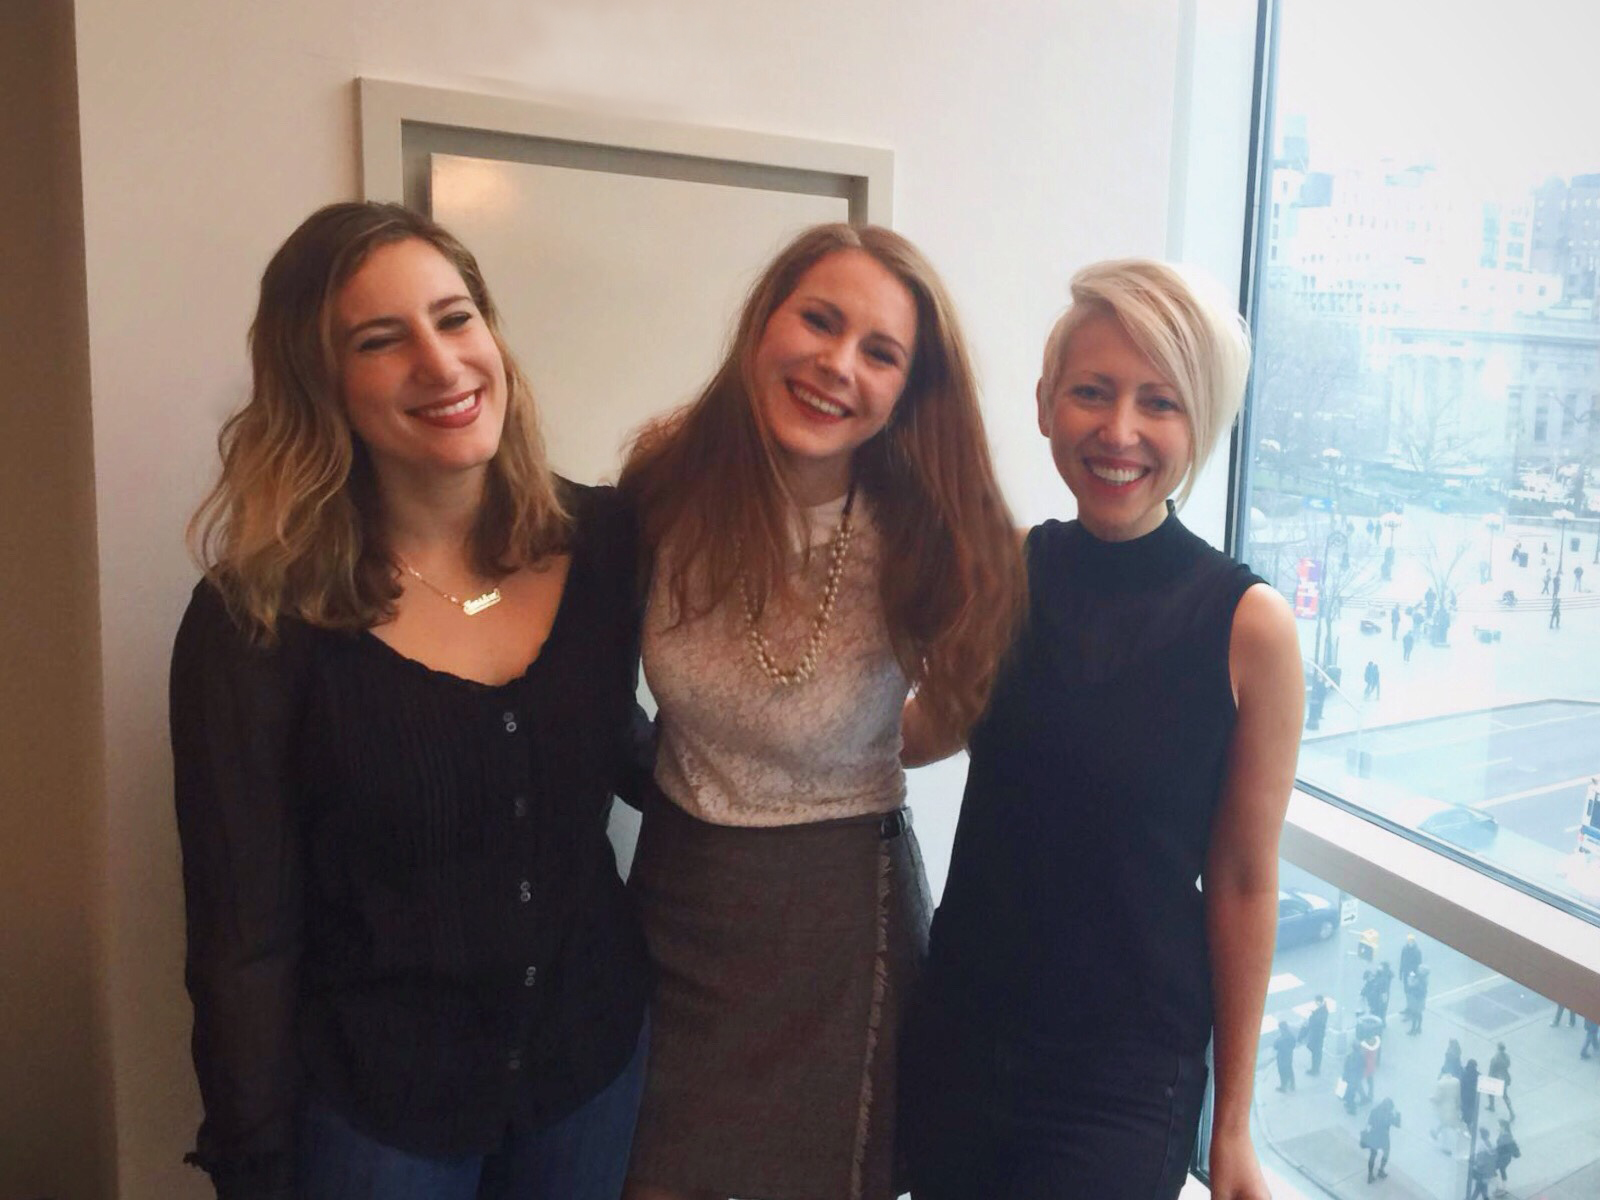 Jessica, Katie and Enke